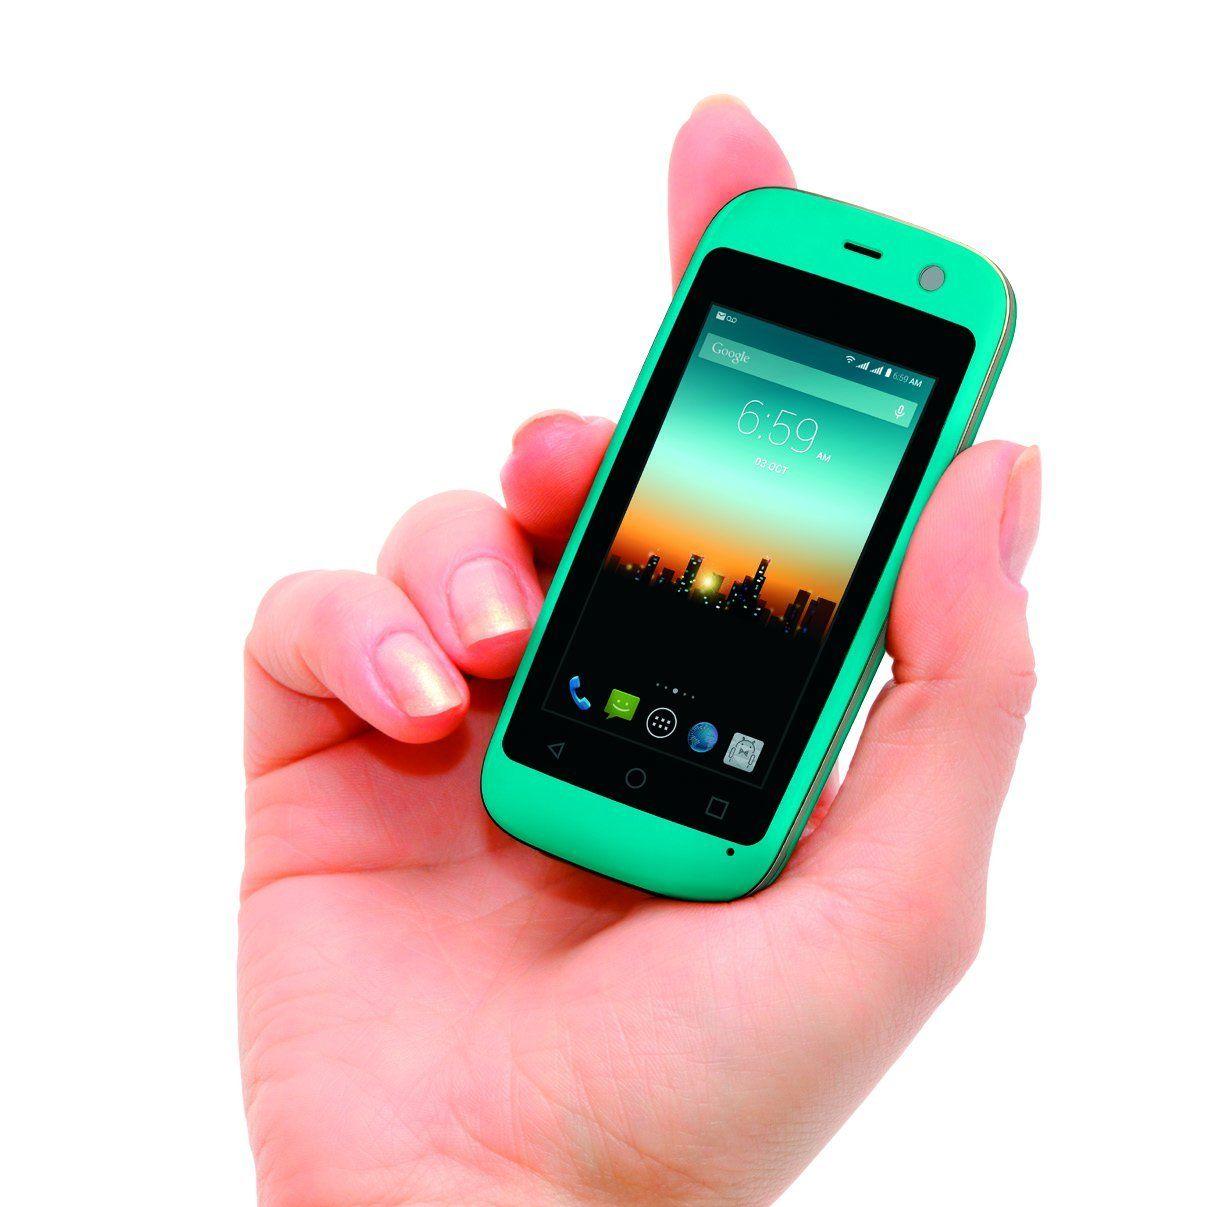 Amazon.com: Posh Mobile Micro X S240 GSM Unlocked 4G ...